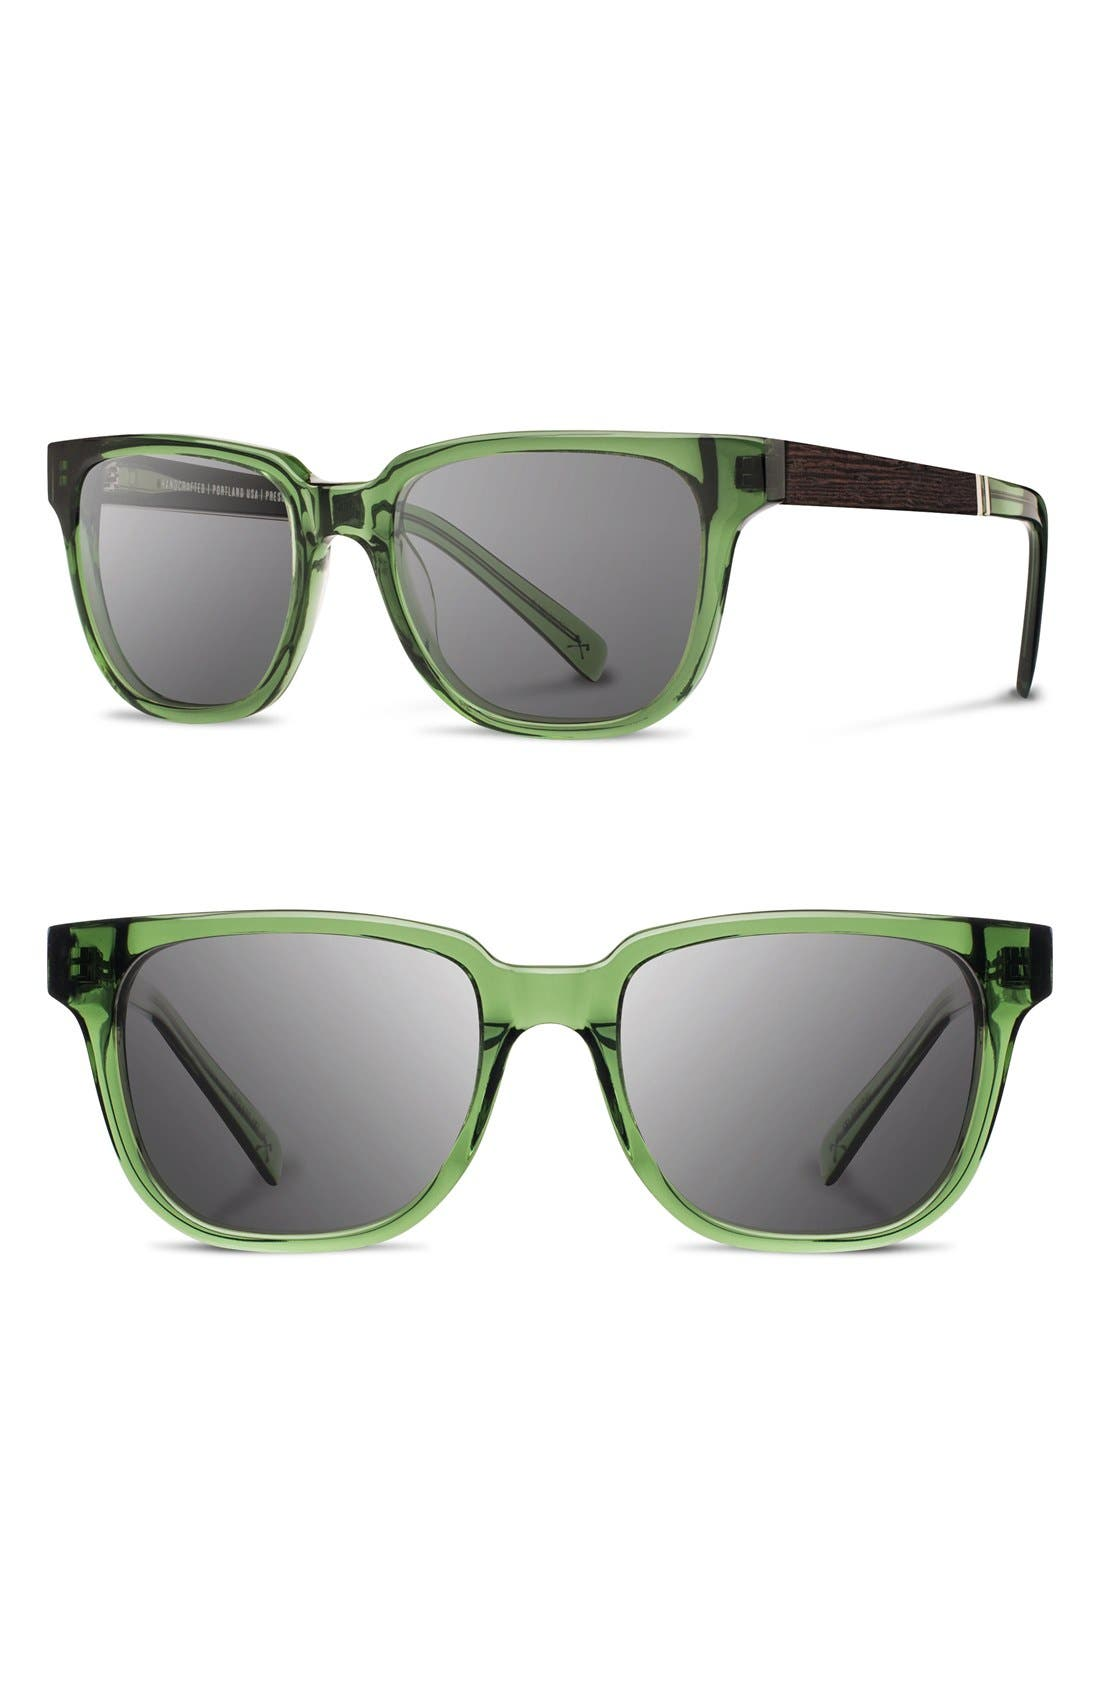 Alternate Image 1 Selected - Shwood 'Prescott' 52mm Polarized Acetate & Wood Sunglasses